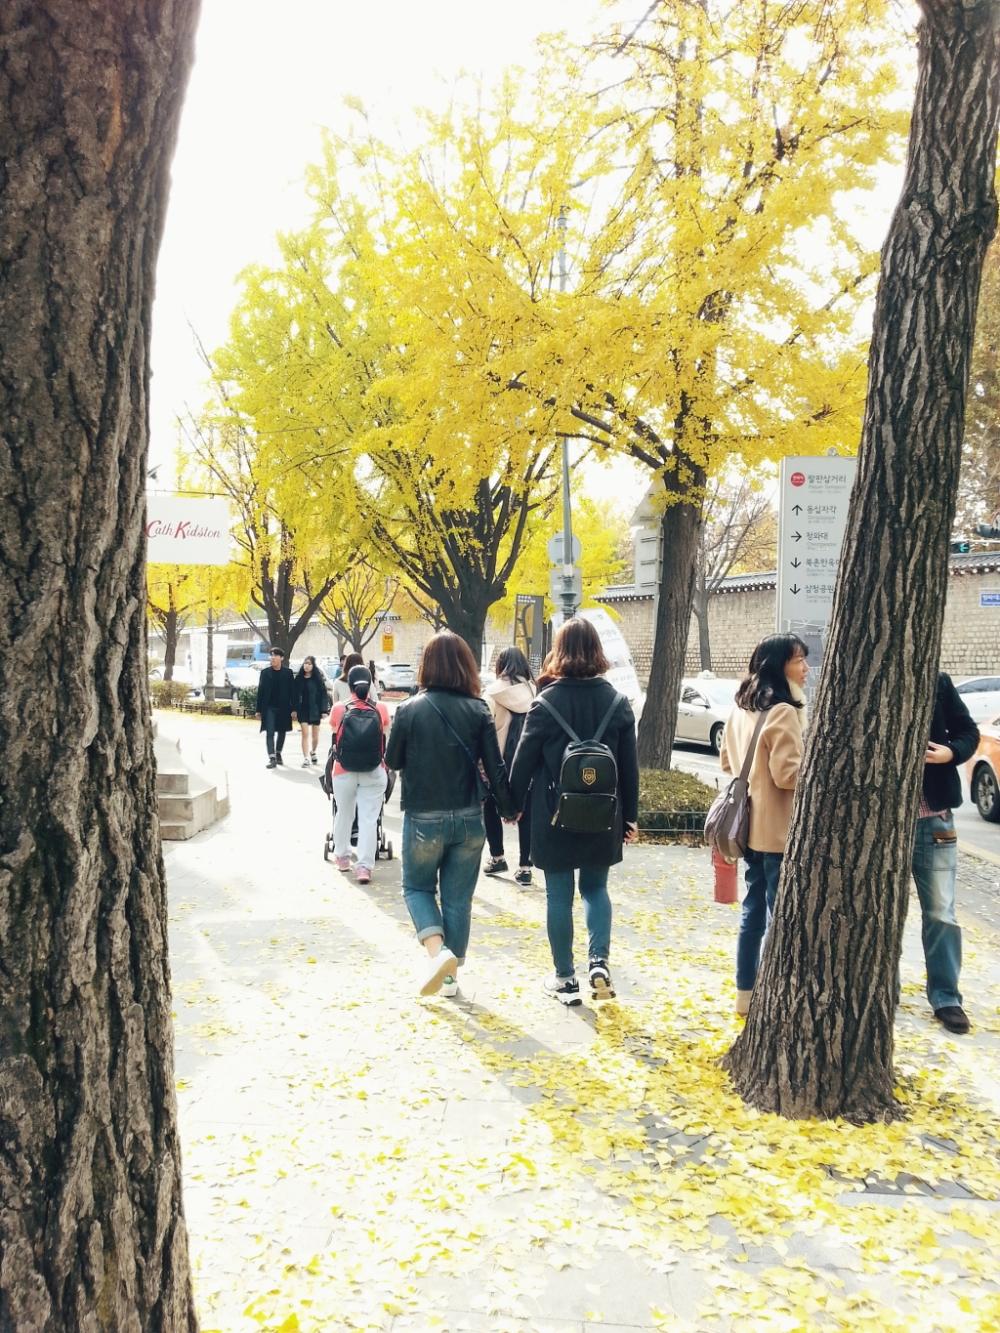 Travel Photographer | Autumn Samcheongdong (삼청동) Seoul South Korea